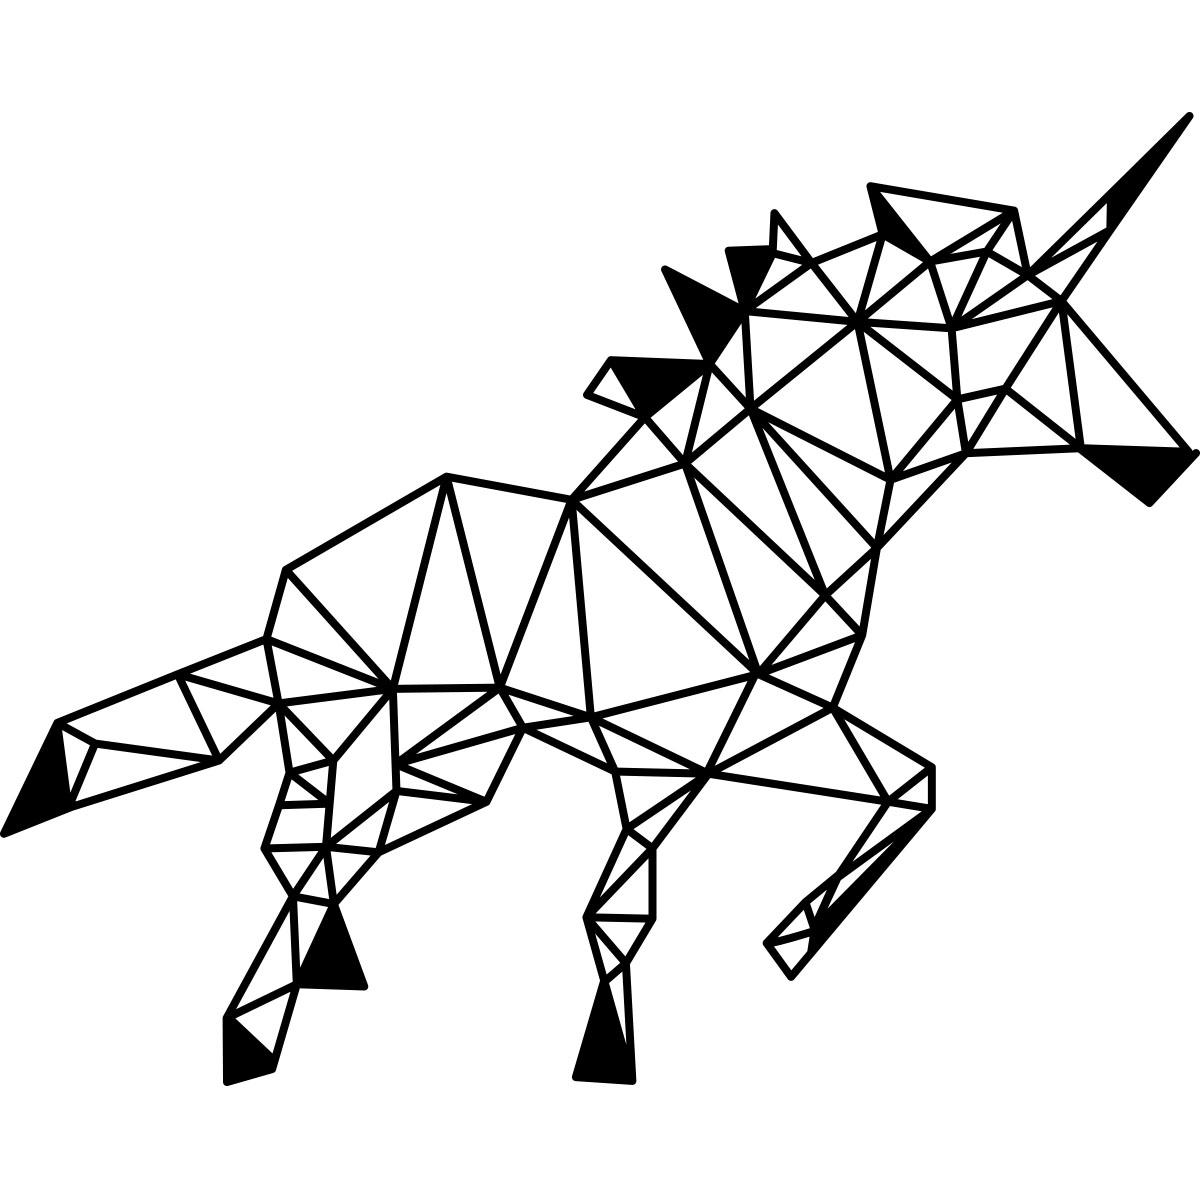 Sticker origami licorne stickers animaux chevaux ambiance sticker - Coloriage geometrique ...